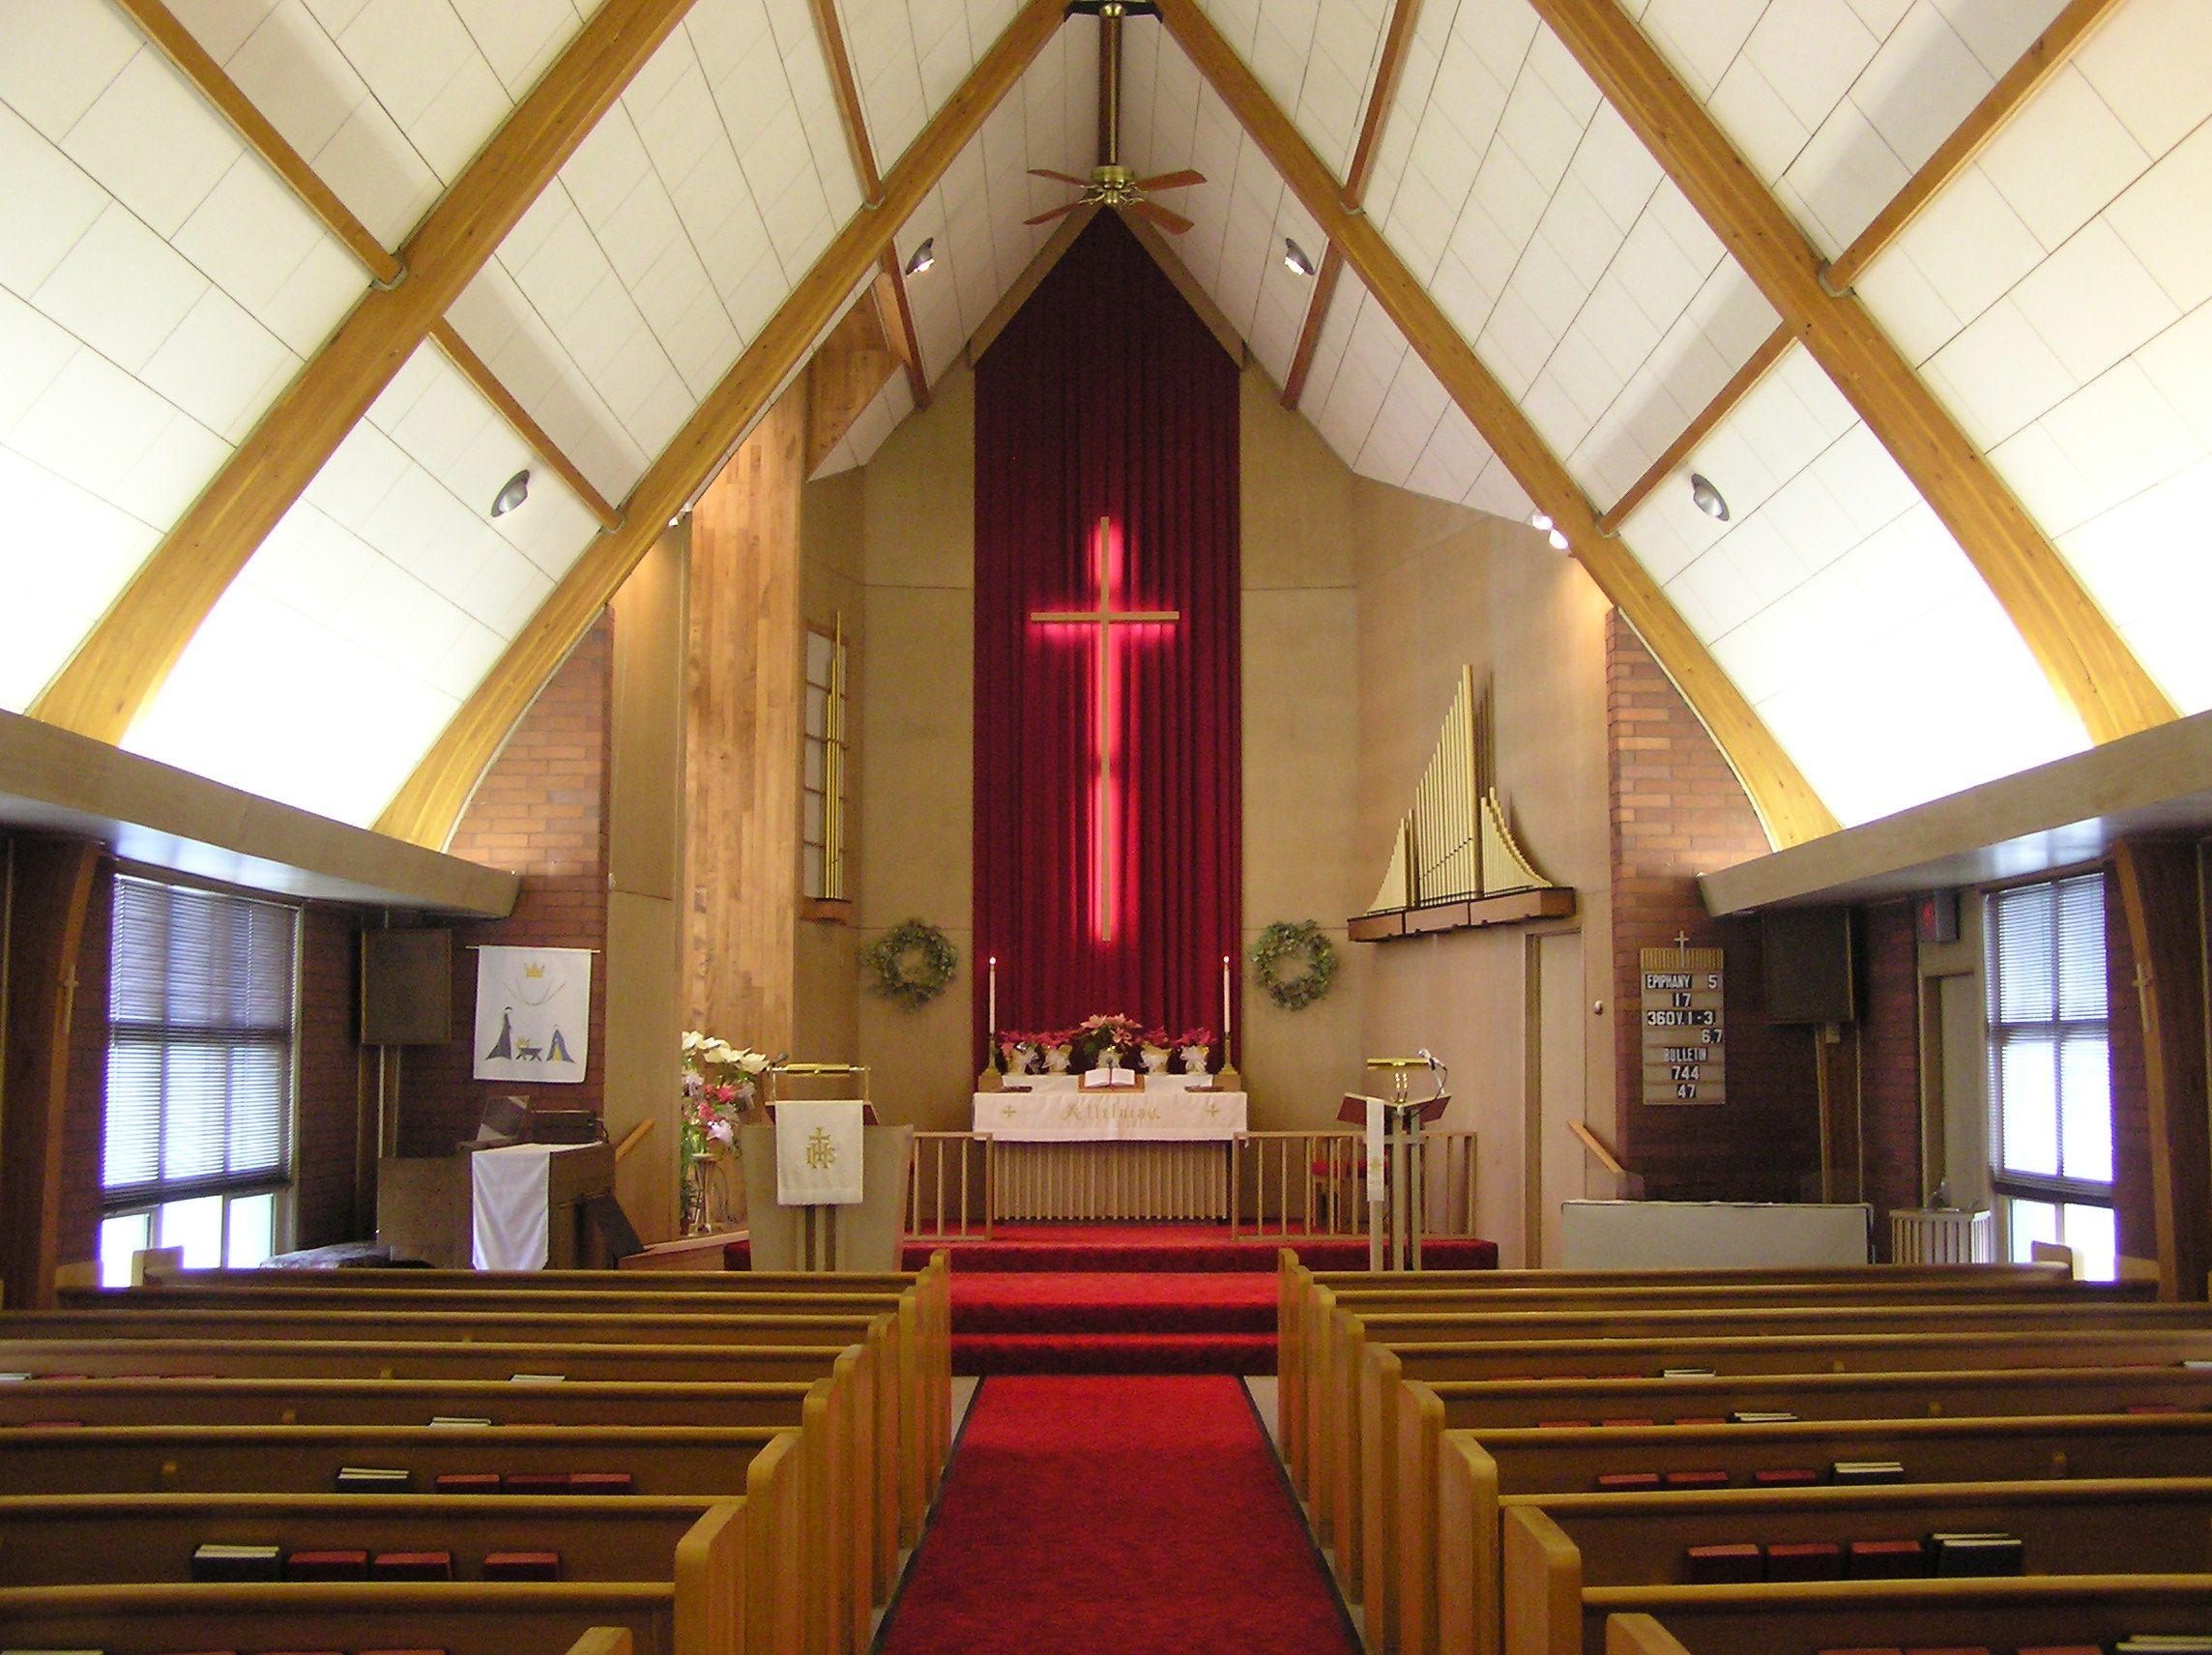 Church | Religion [CODE1161] | Pinterest | Churches